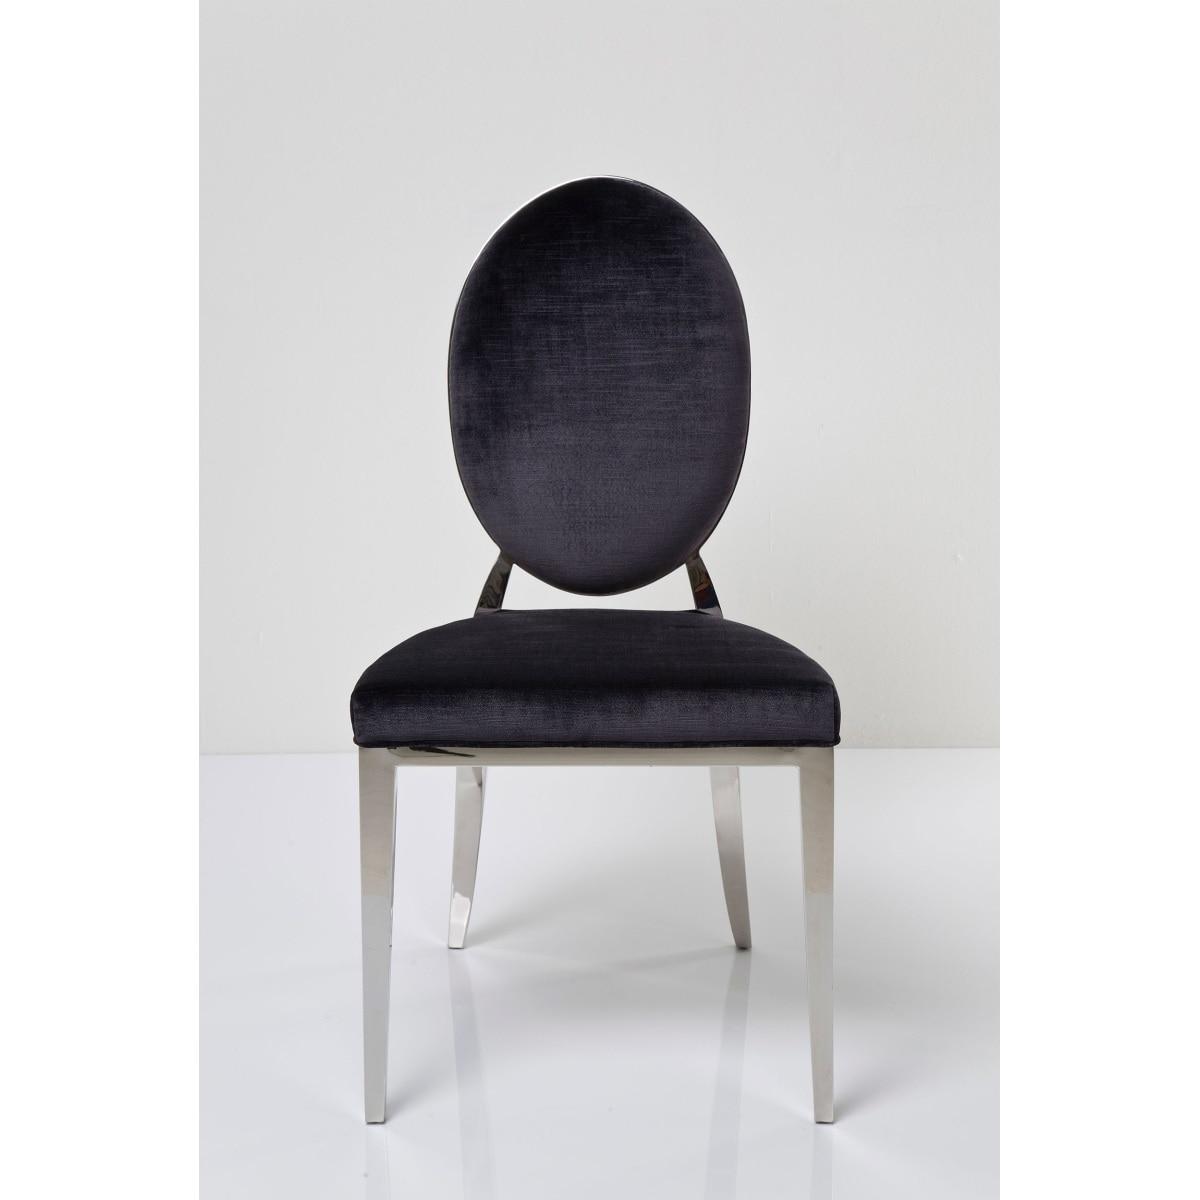 stuhl mit gestell aus edelstahl porta porta m bel. Black Bedroom Furniture Sets. Home Design Ideas